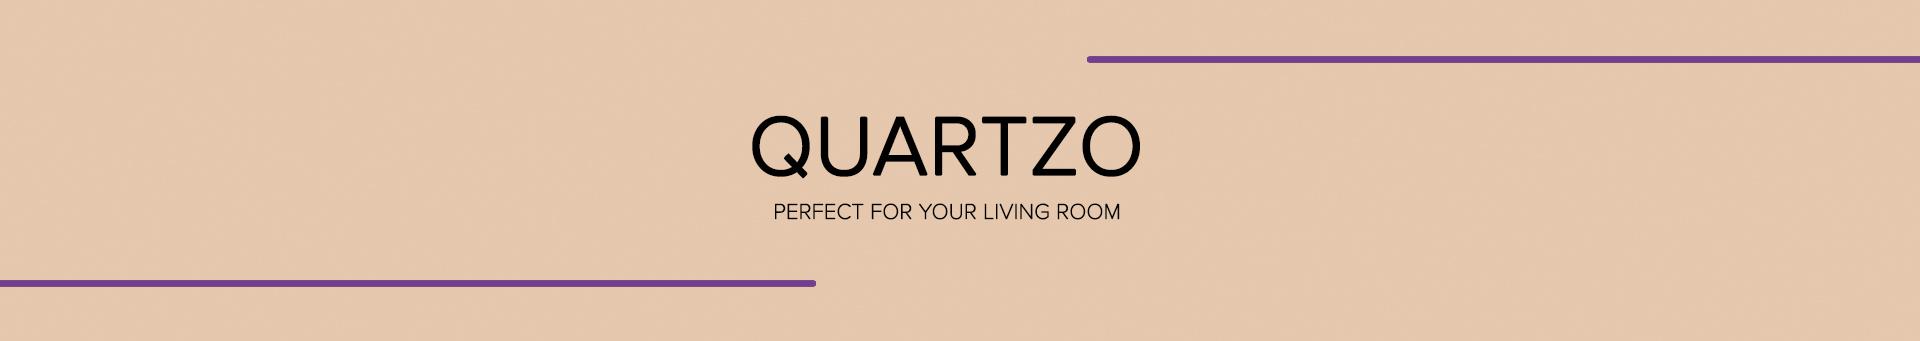 Quartzo TV Stand